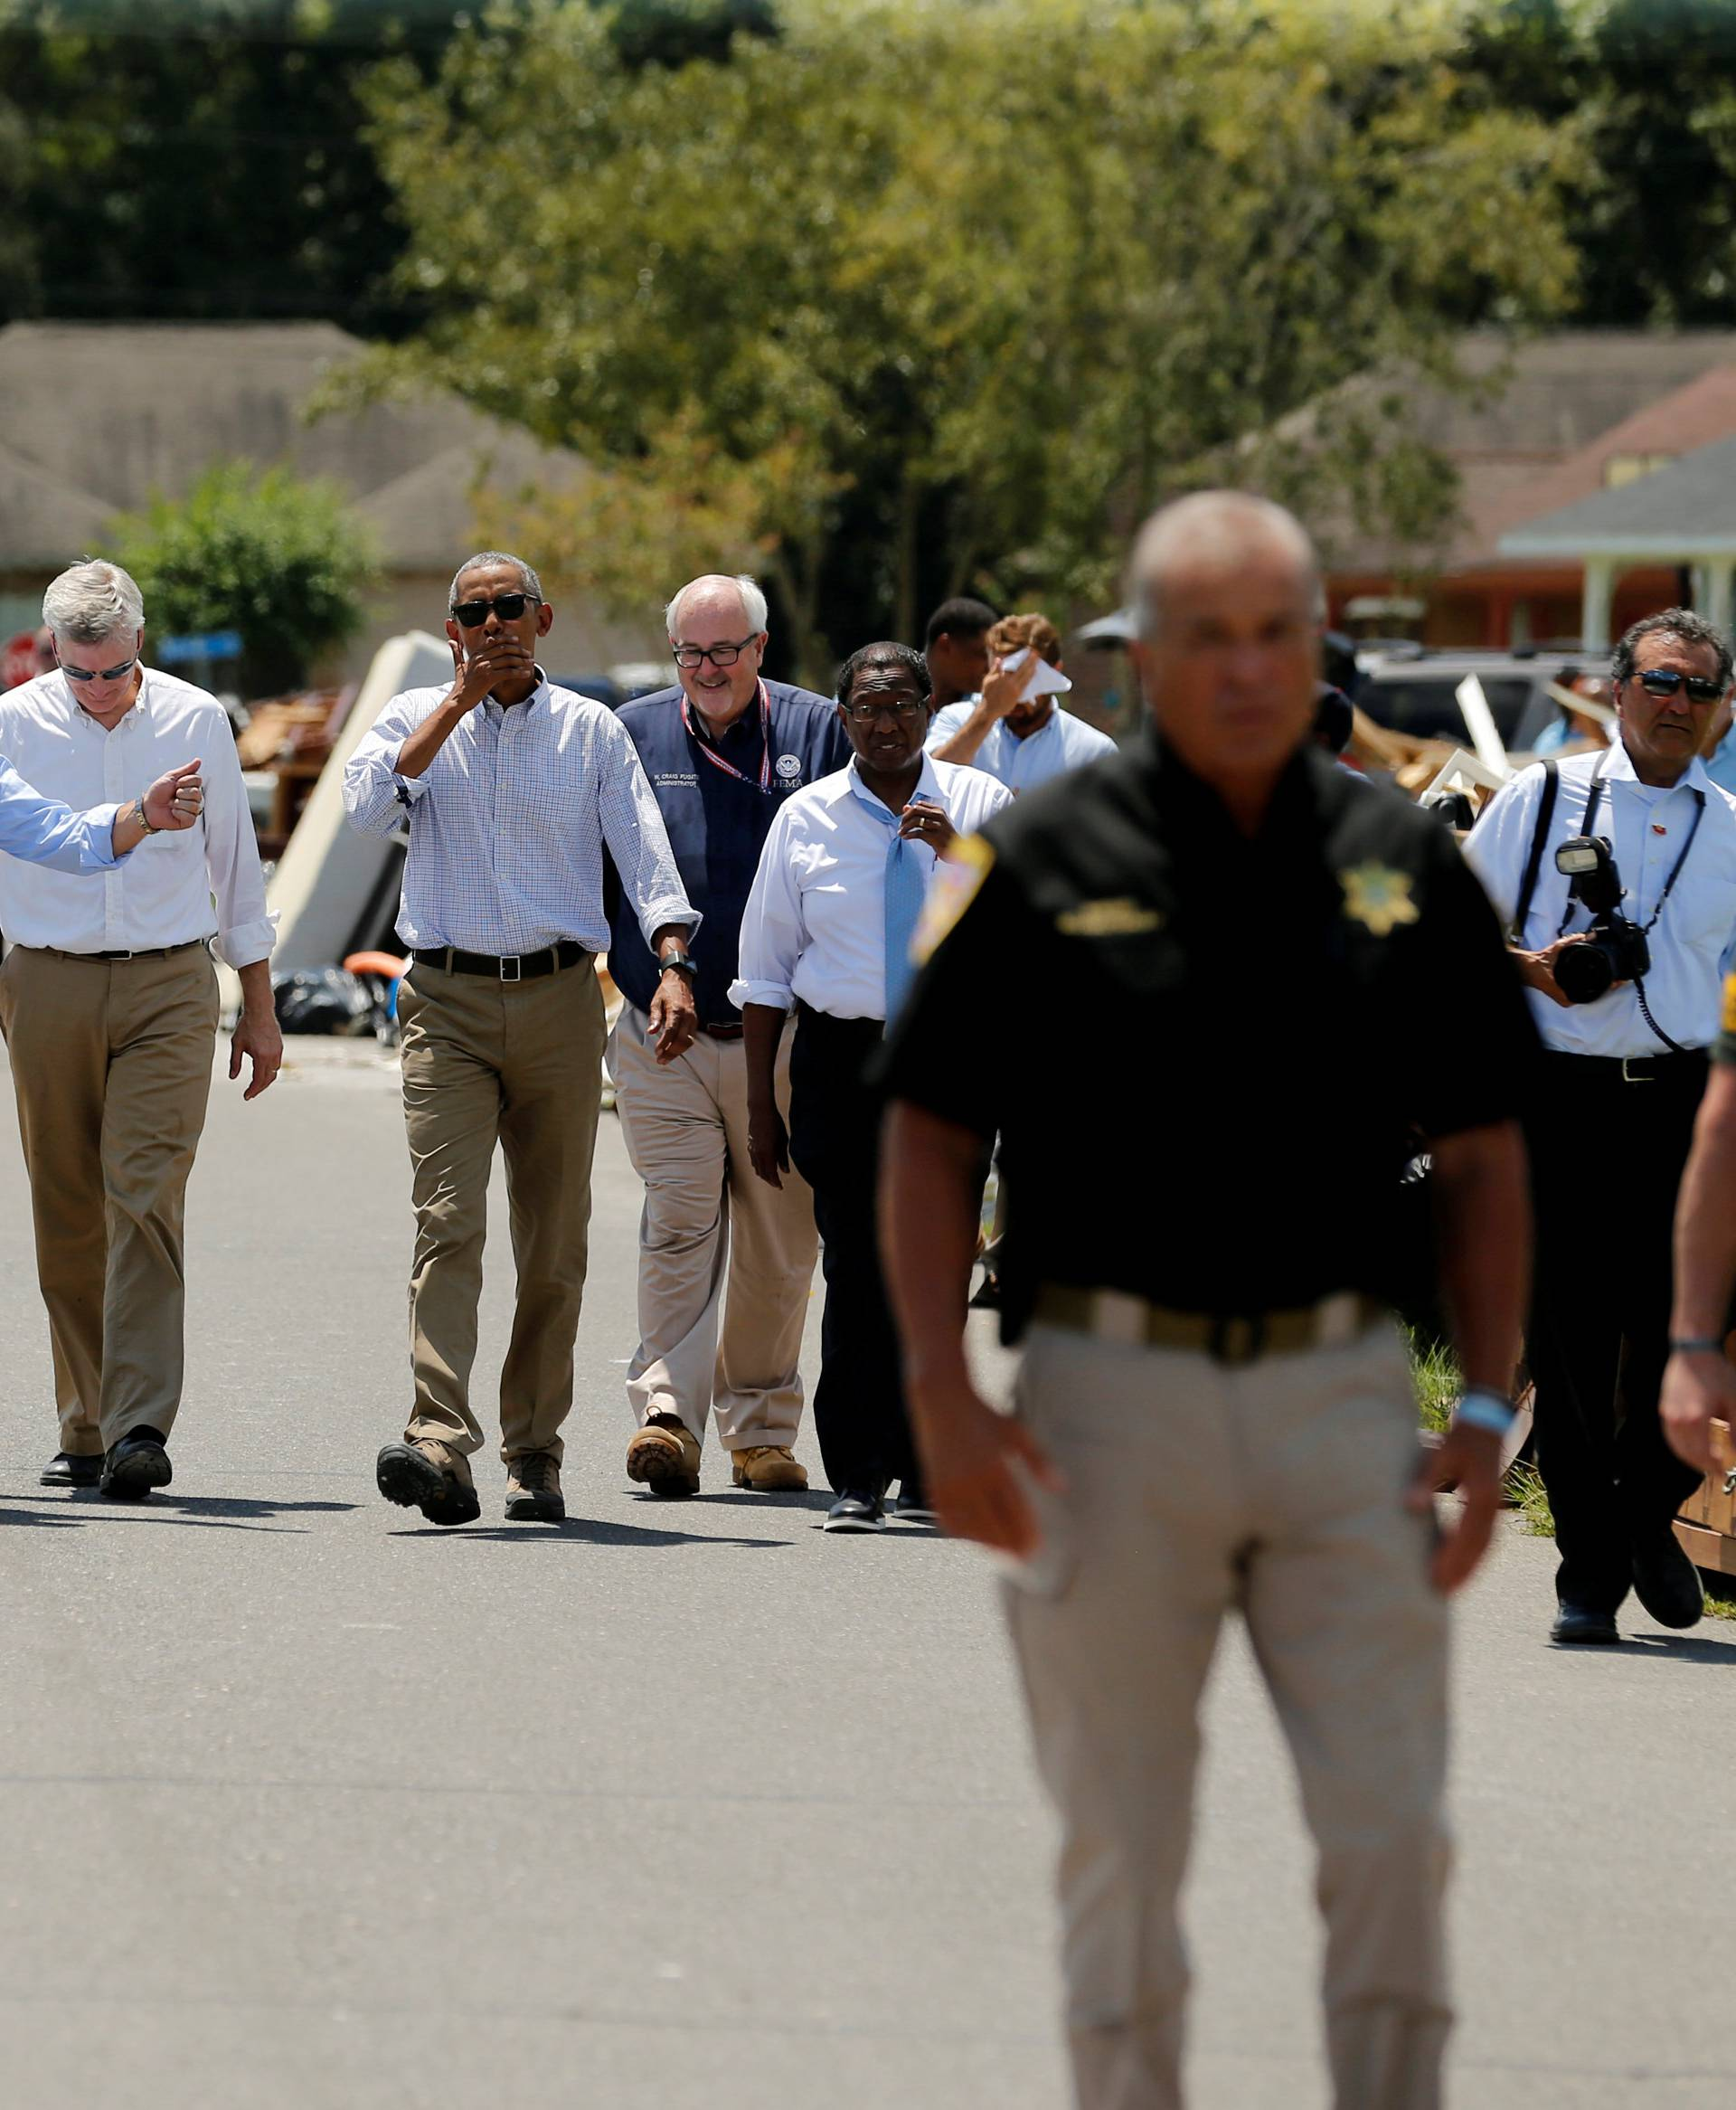 U.S. President Barack Obama tours a flood-affected neighborhood with U.S. Senator David Vitter, Louisiana Governor John Bel Edwards and U.S. Senator Bill Cassidy in Zachary